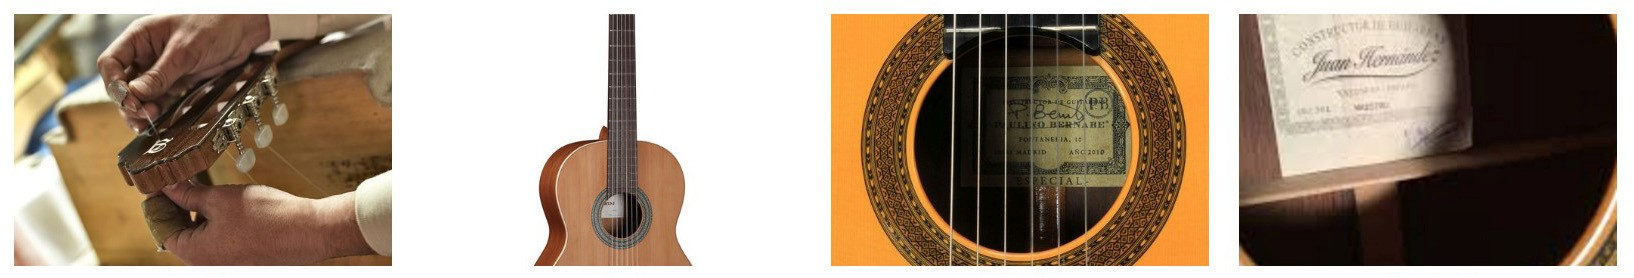 guitars-image-1.jpg